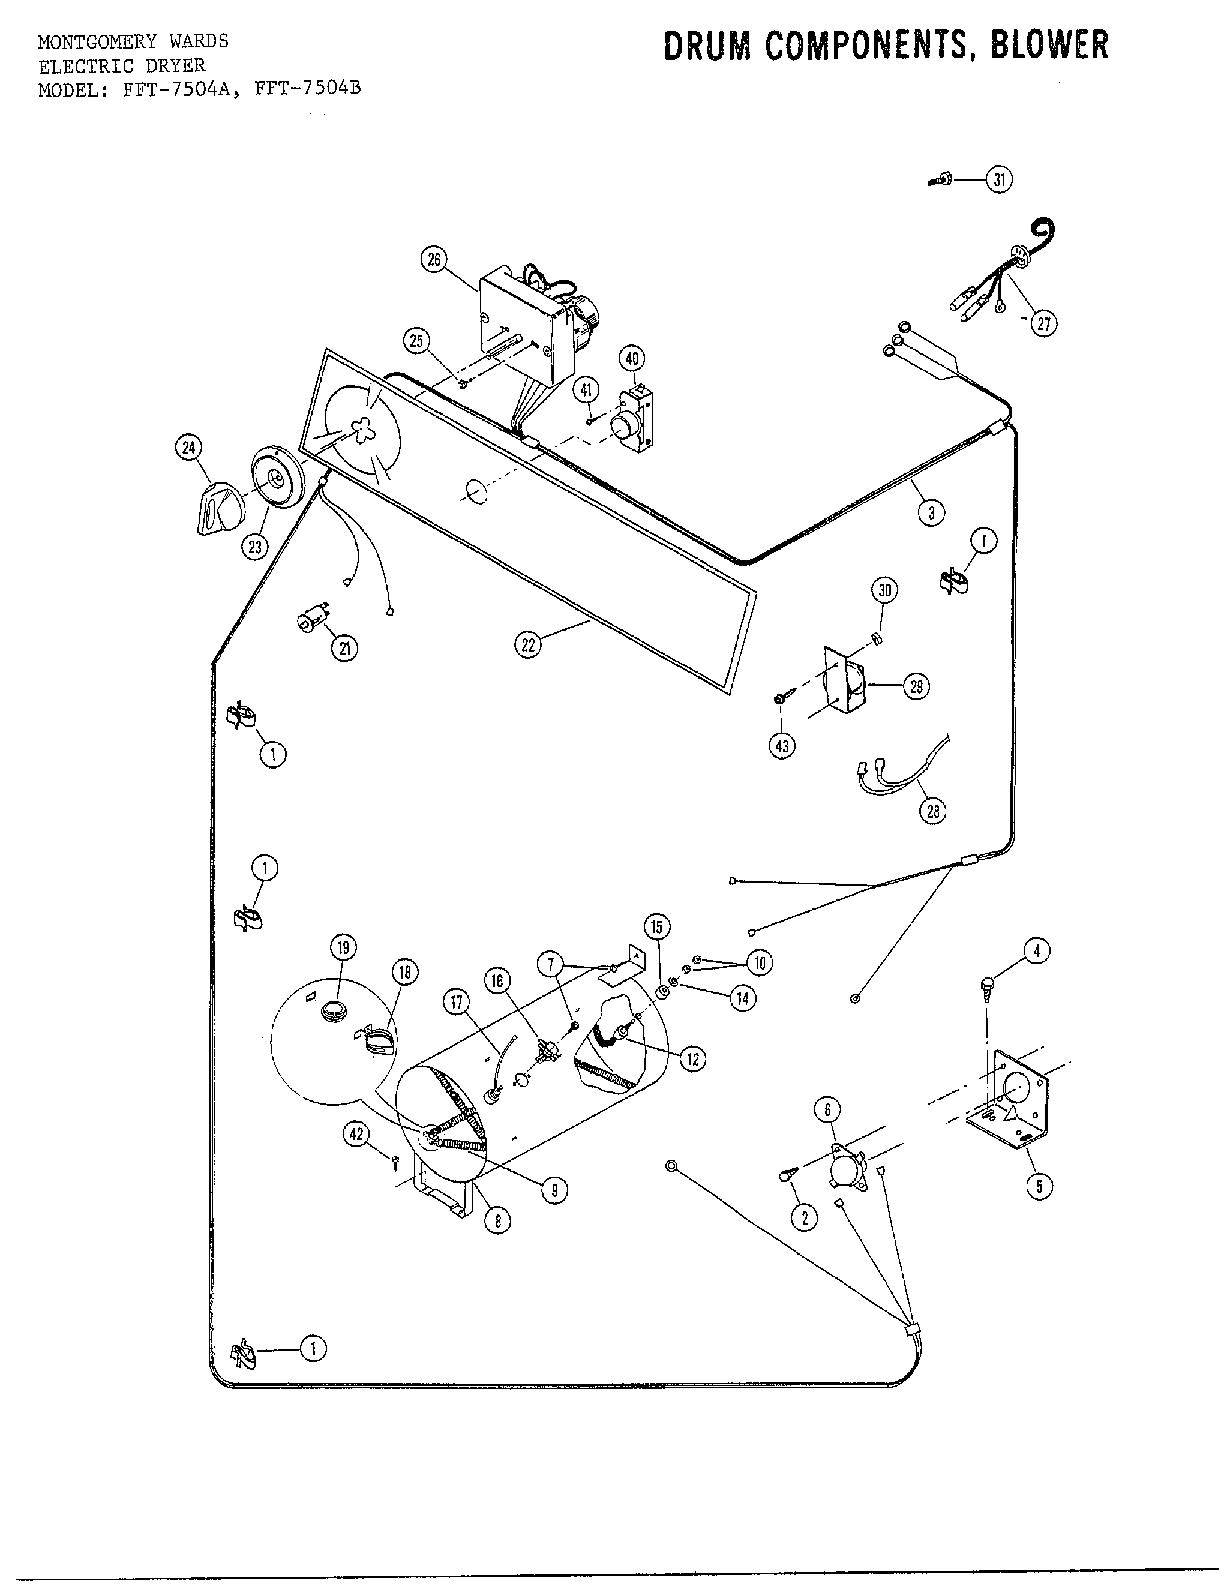 Wiring Diagram: 27 Frigidaire Dryer Parts Diagram